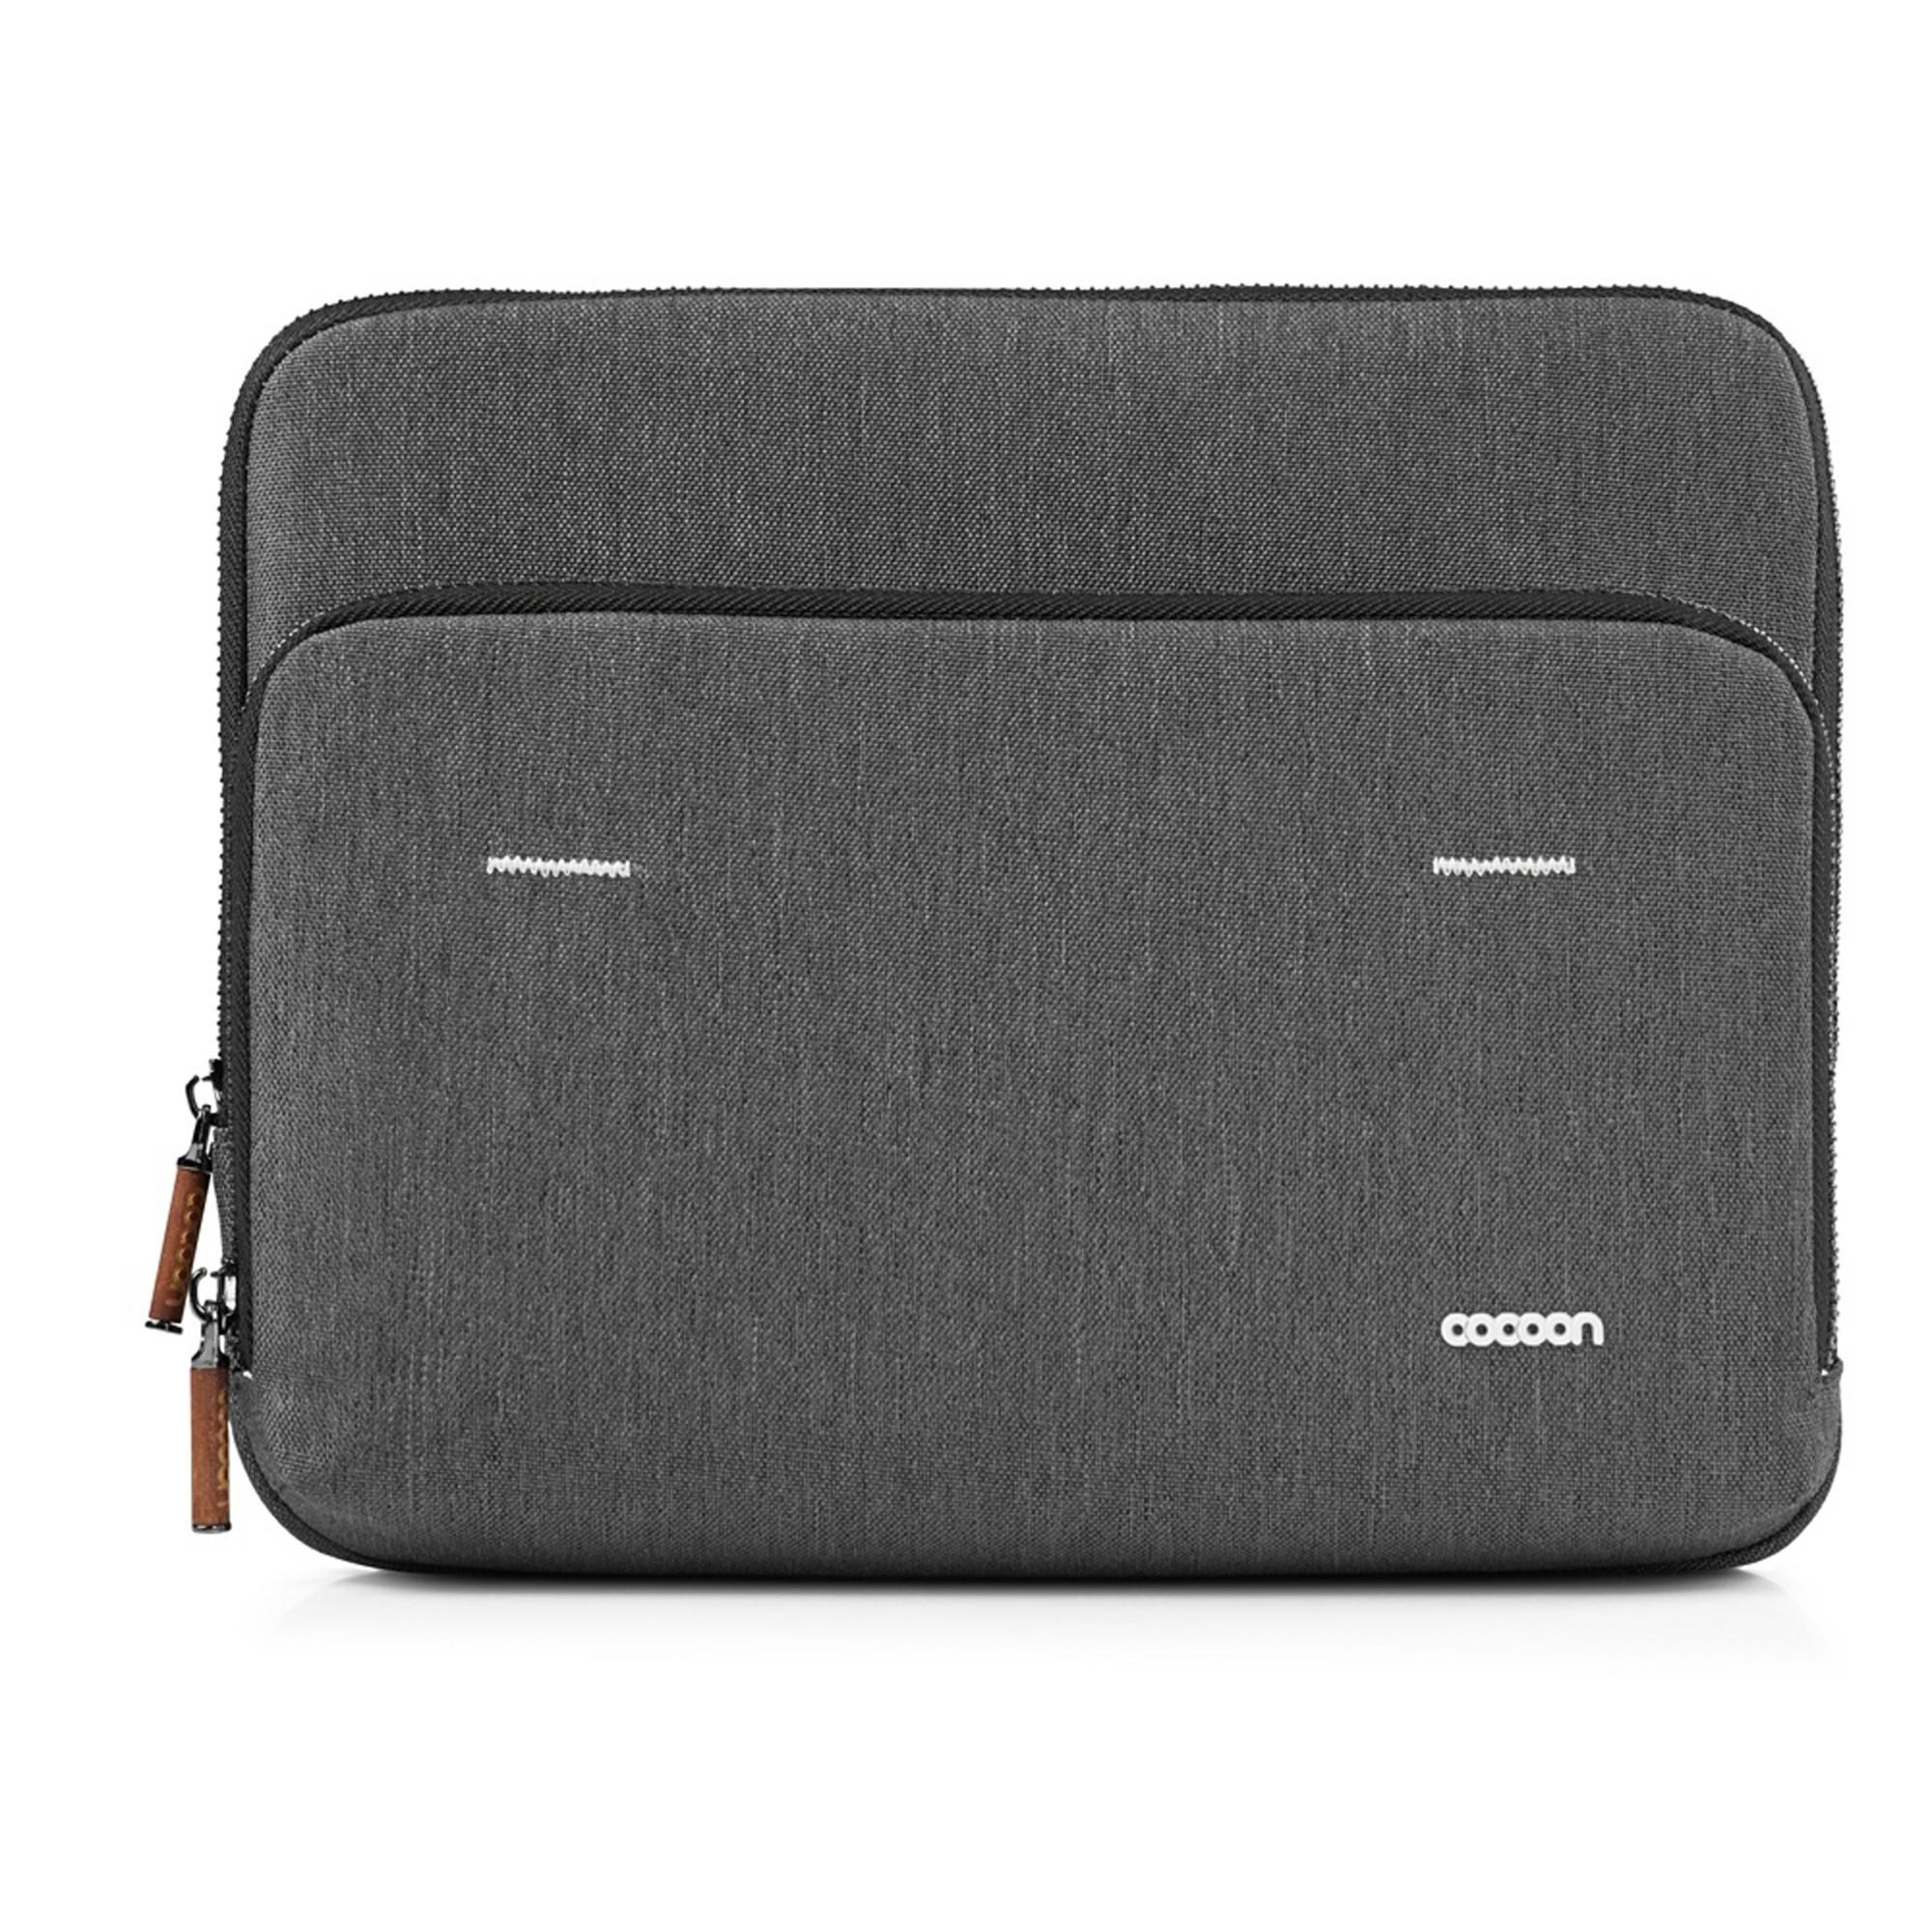 Cocoon Graphite iPad Sleeve